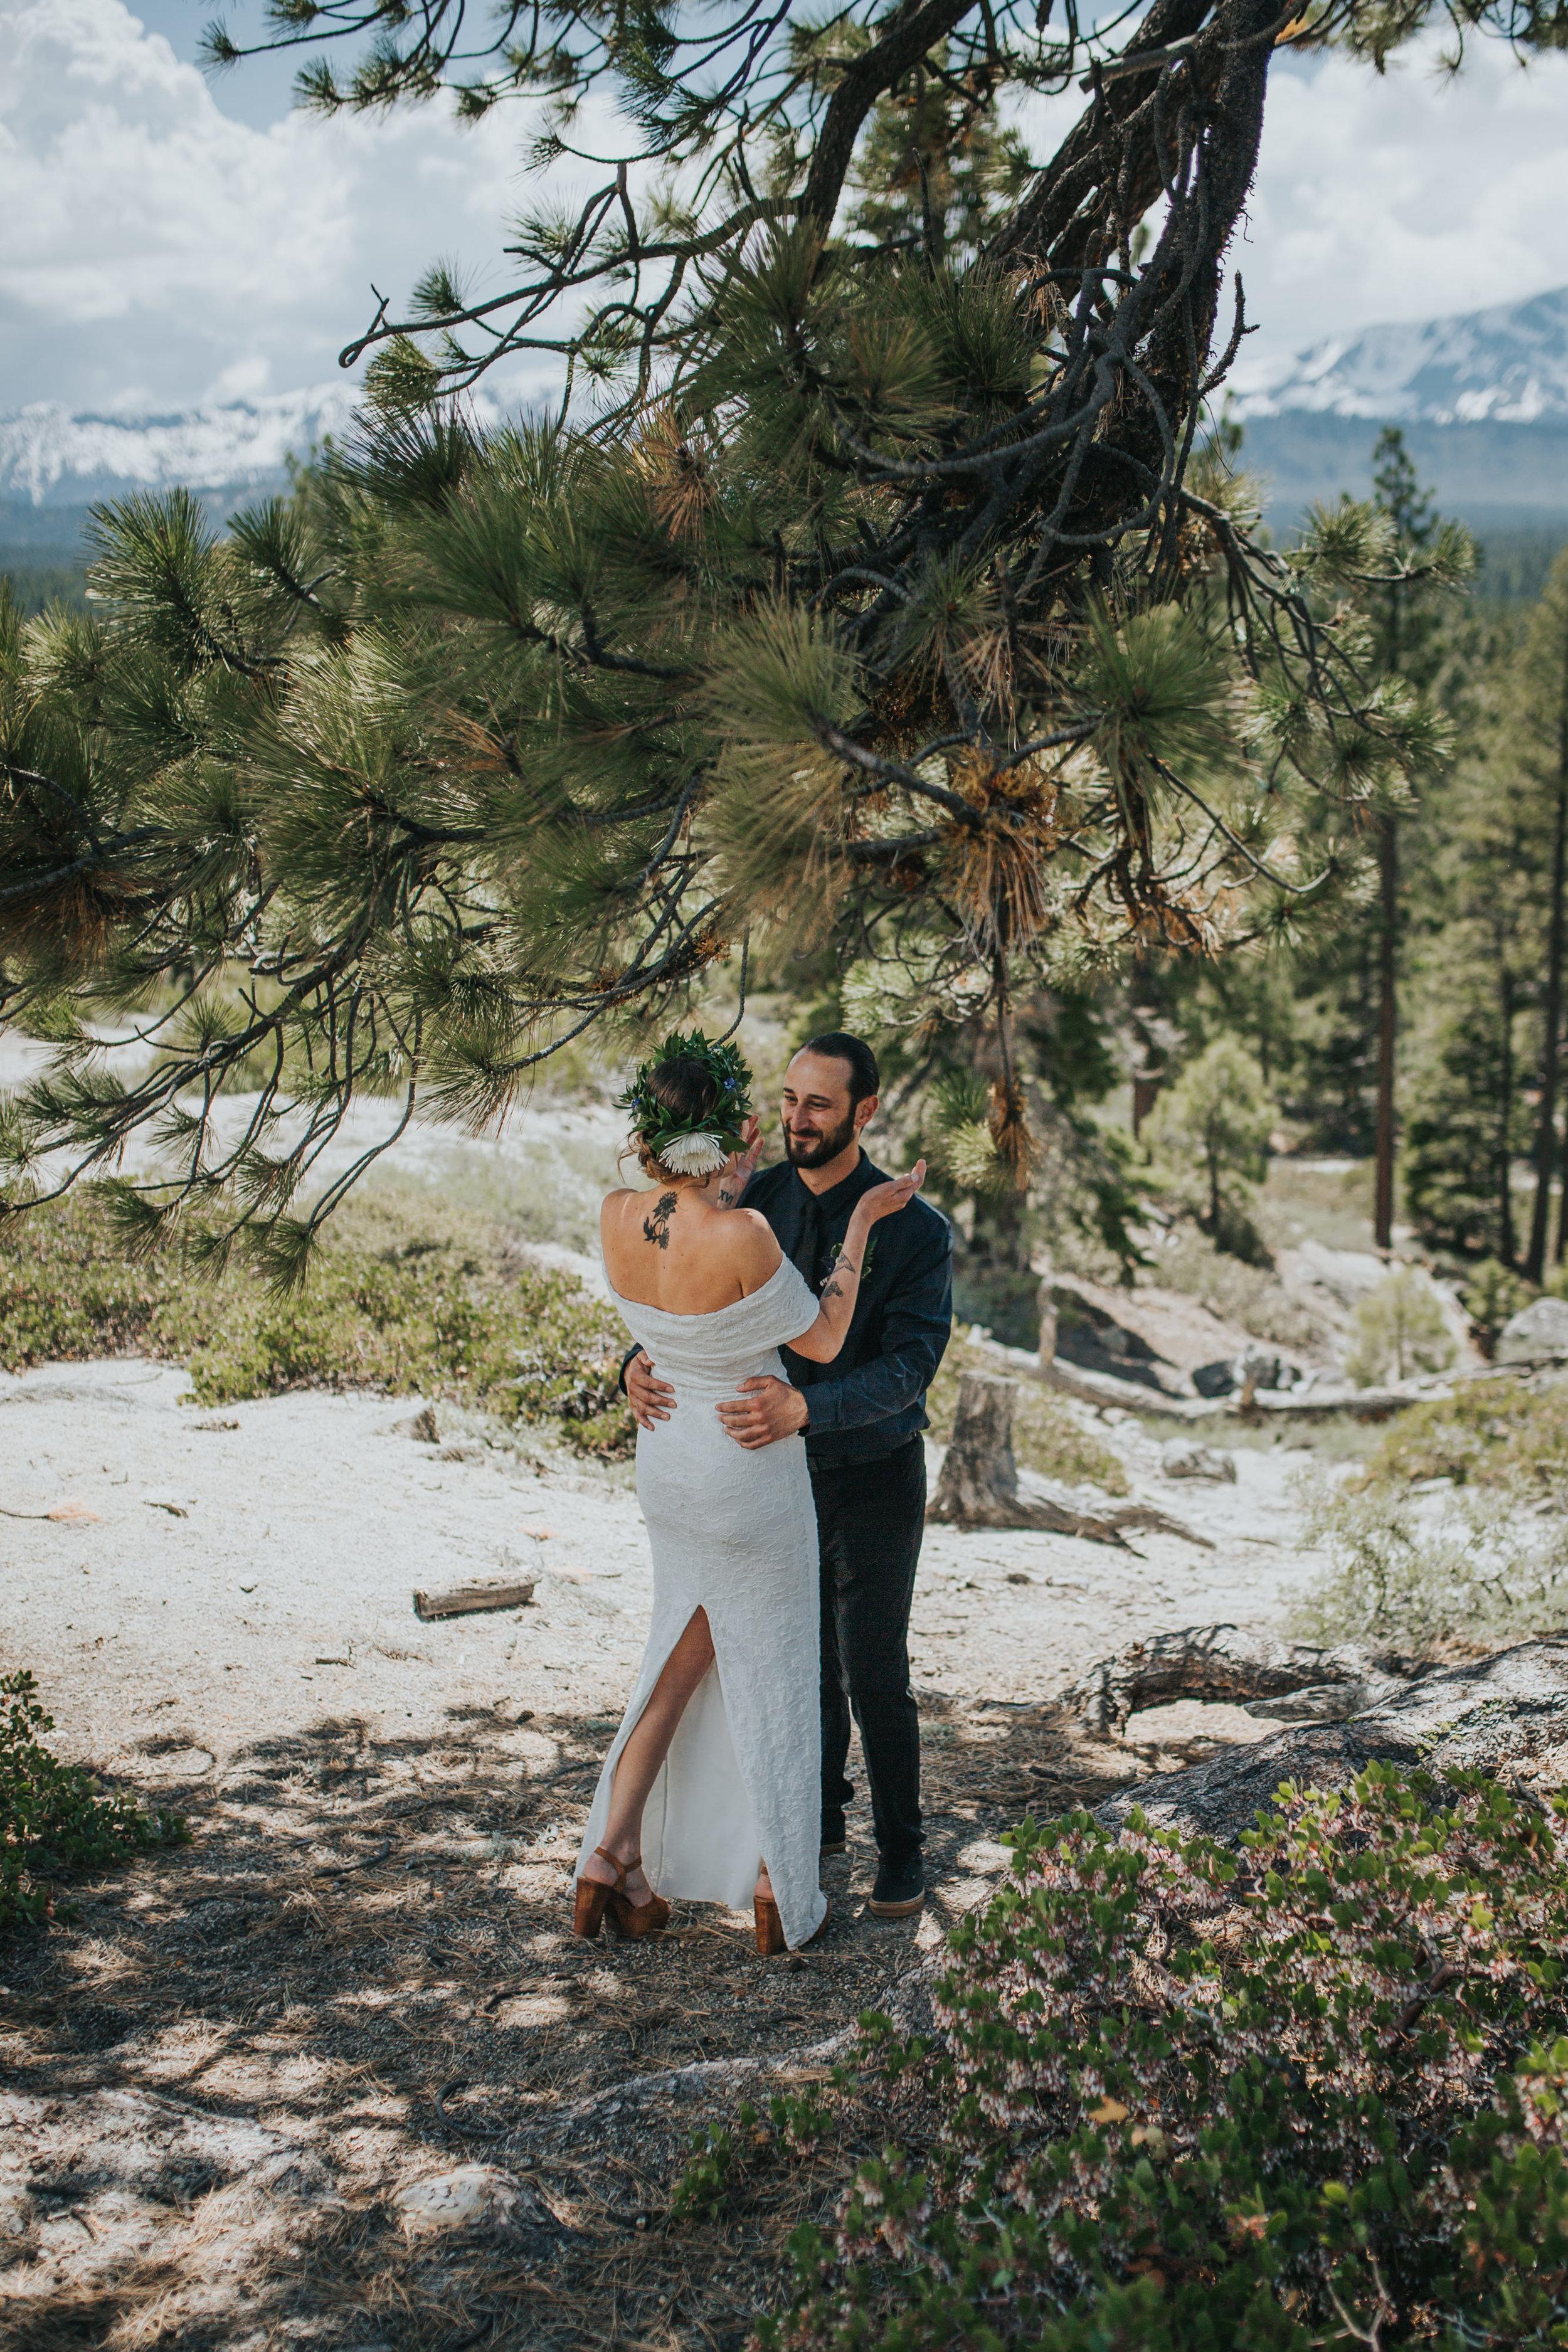 south-lake-tahoe-elopement-valerie-lendvay-photo-010.jpg